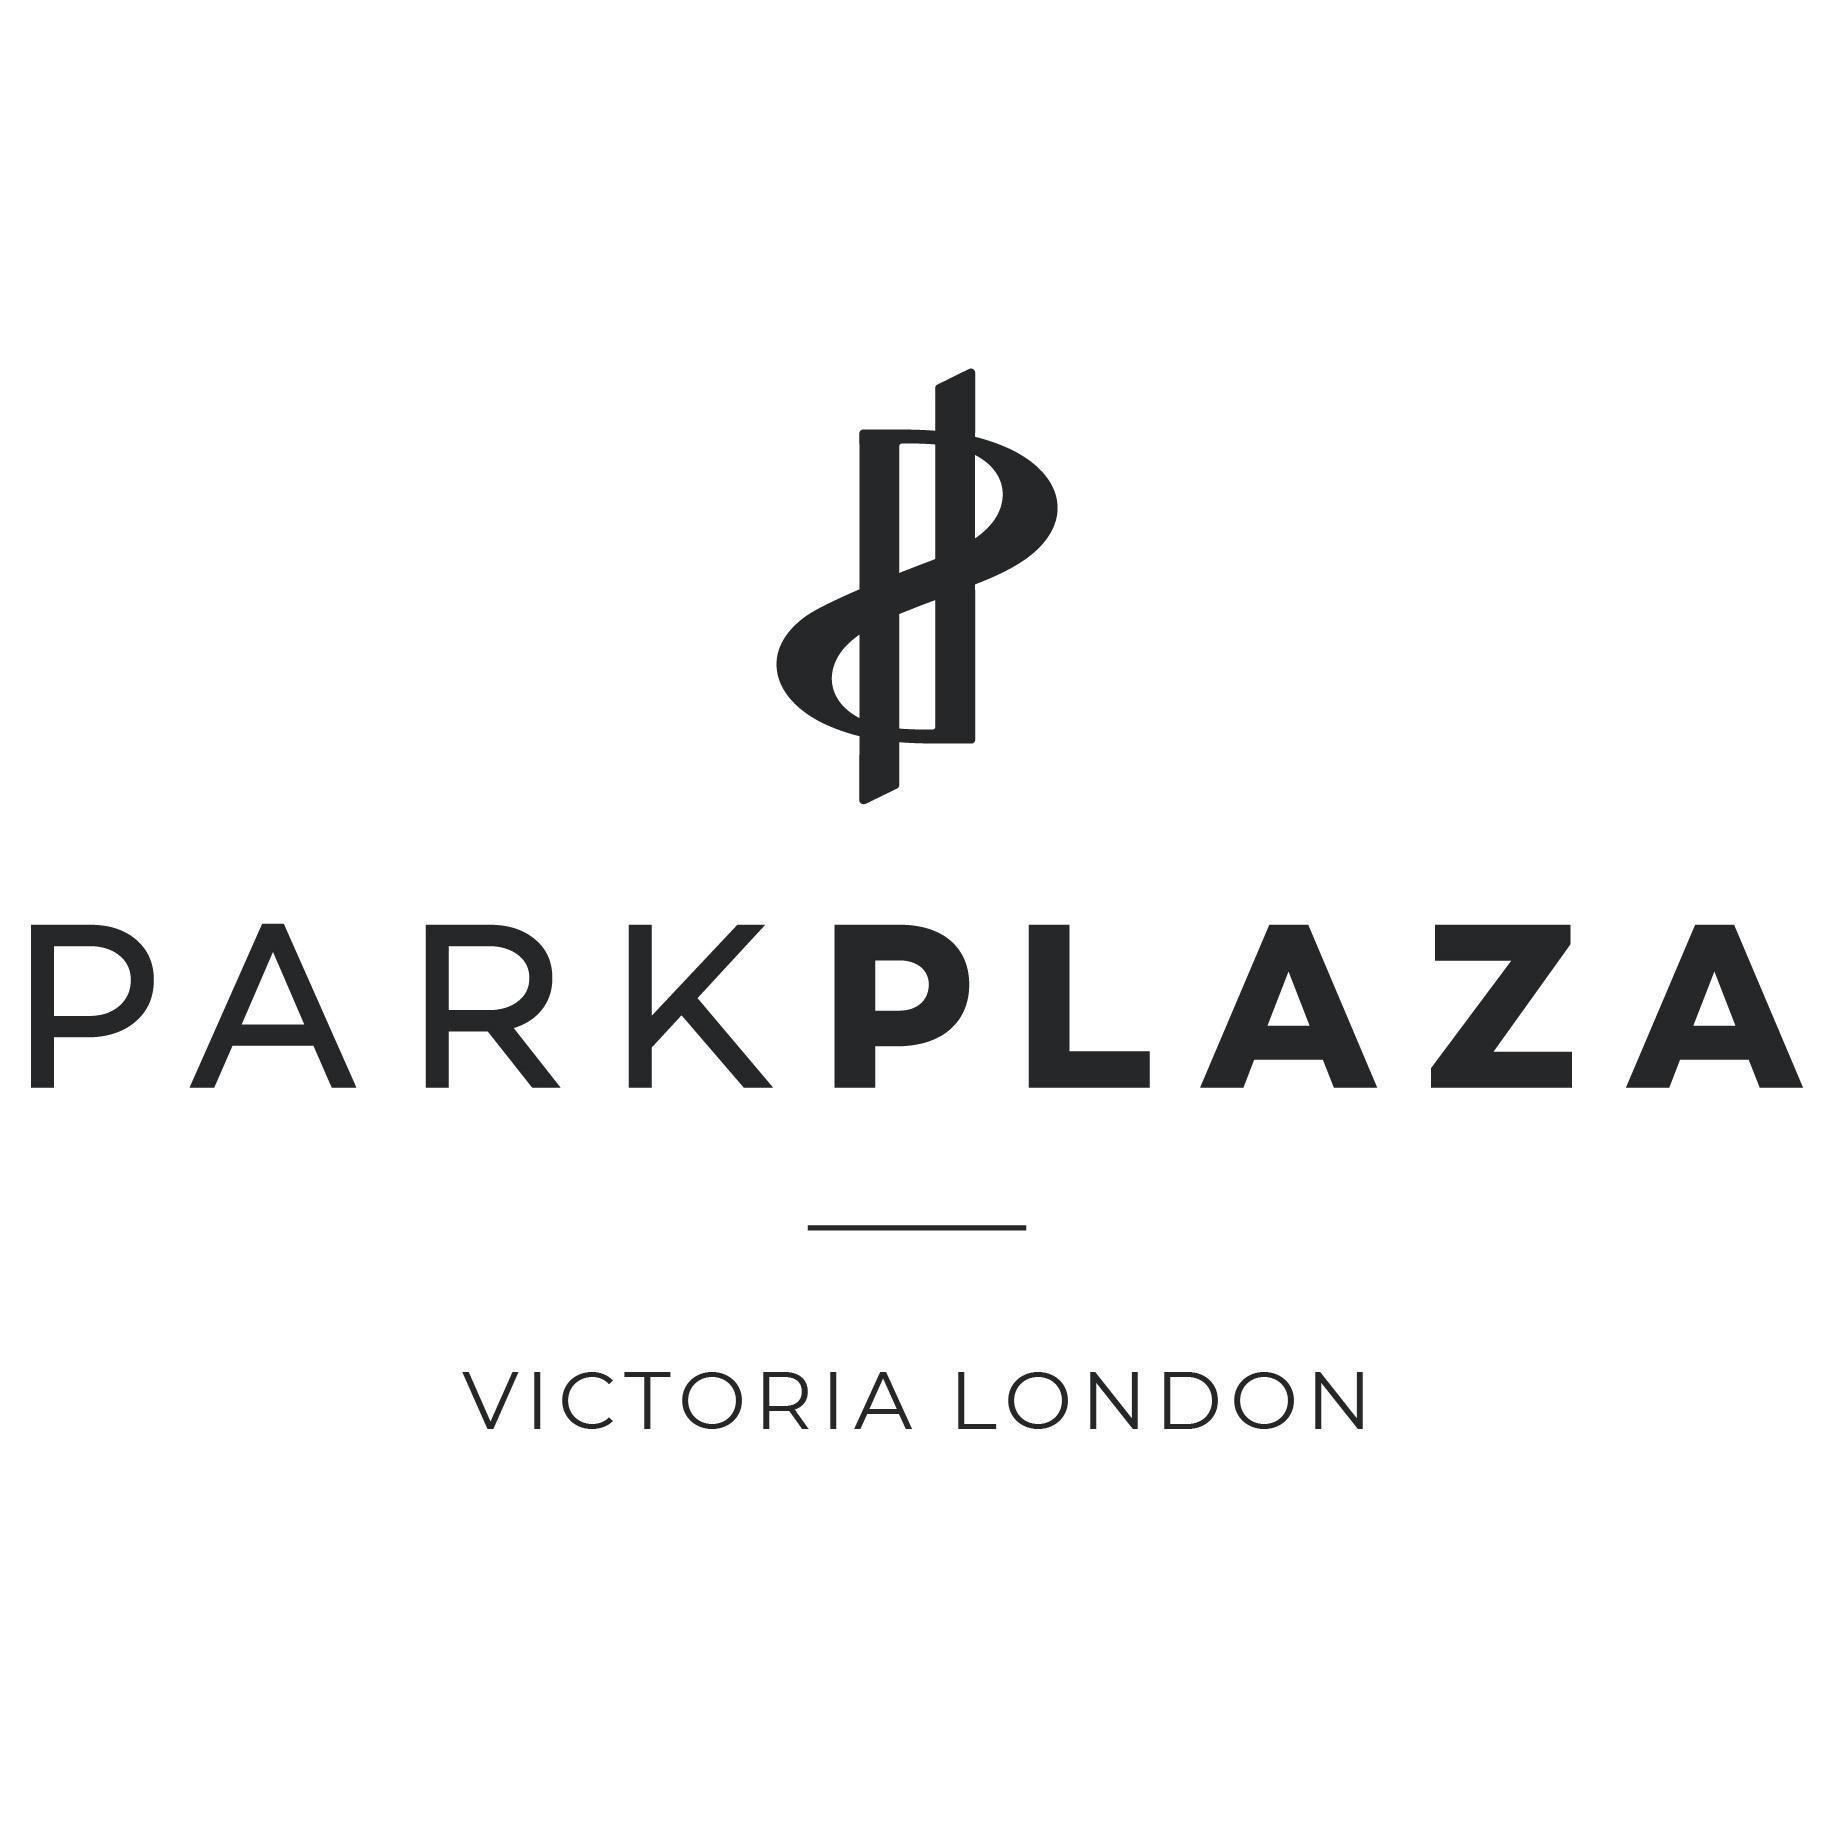 Park Plaza Victoria London